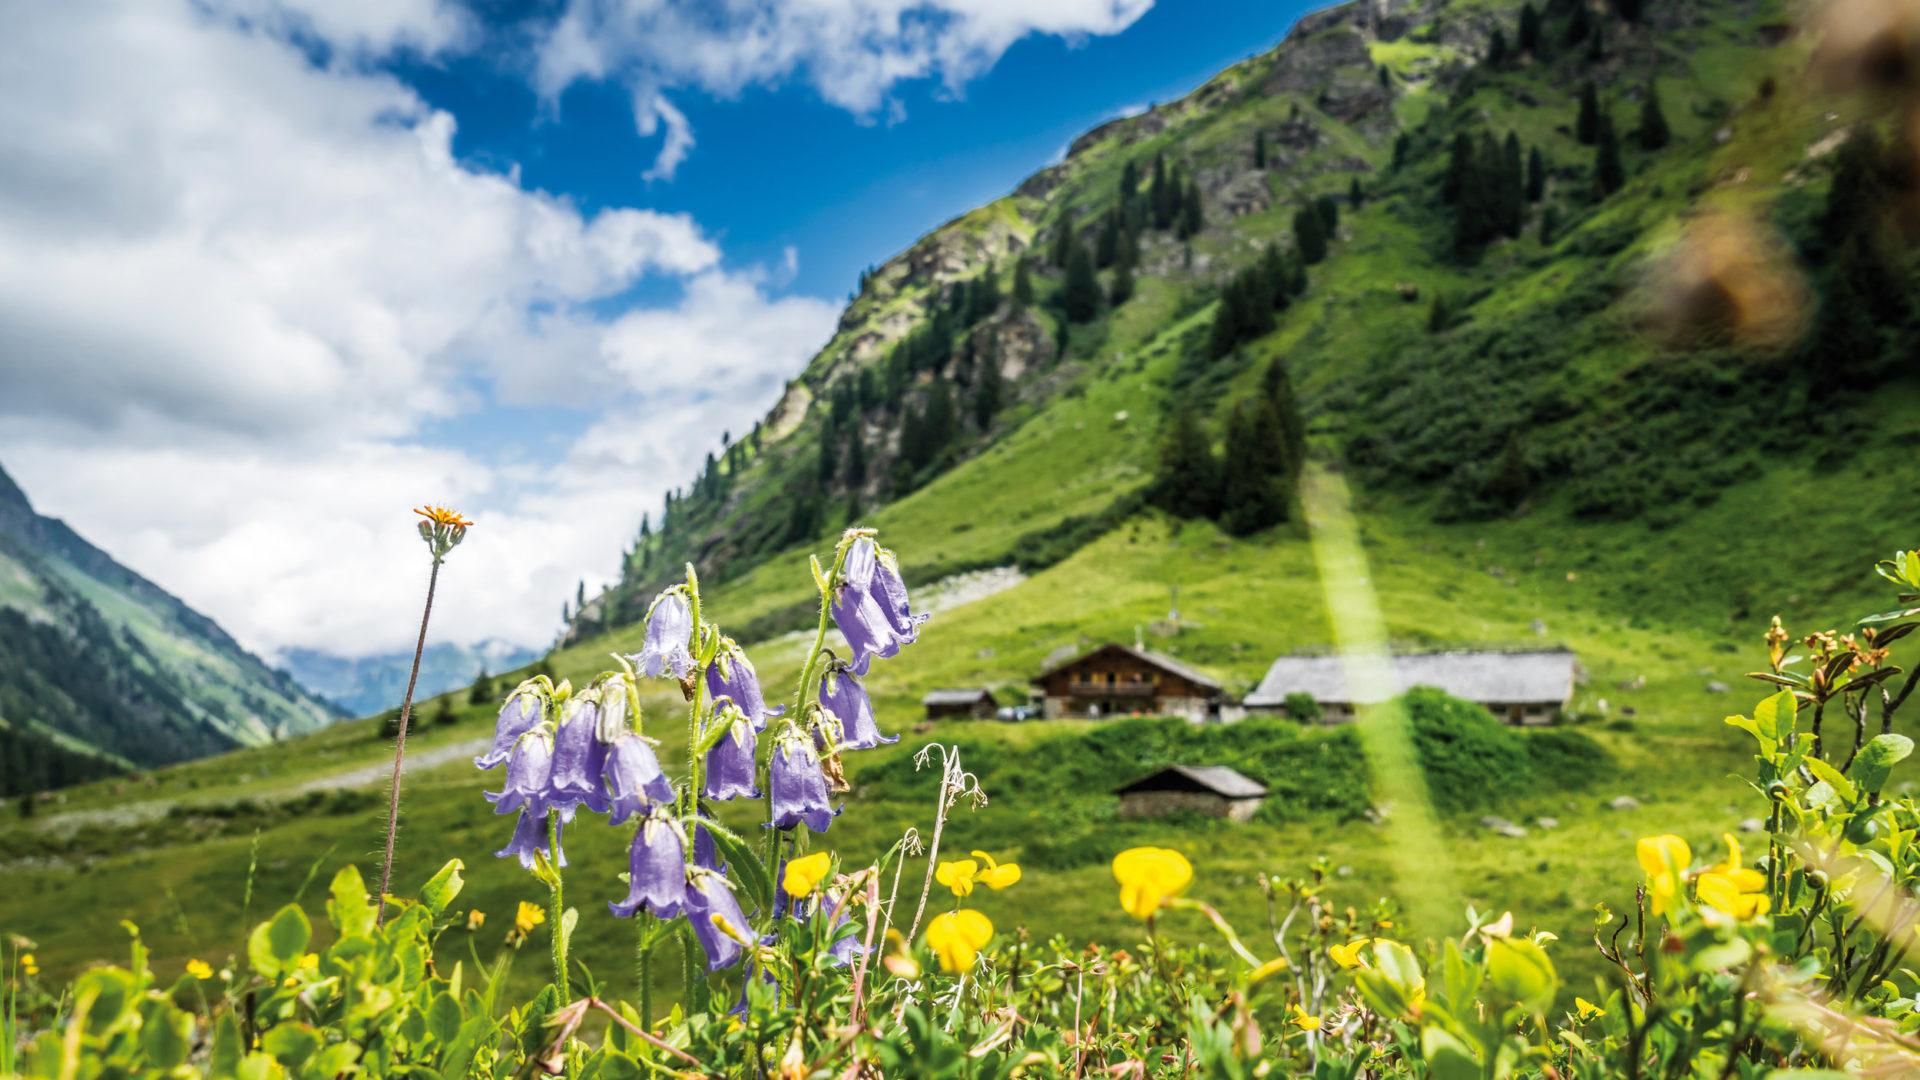 Vorarlberg Karte Berge.Wandern In Vorarlberg Tipps Und Online Wanderkarte Vorarlberg